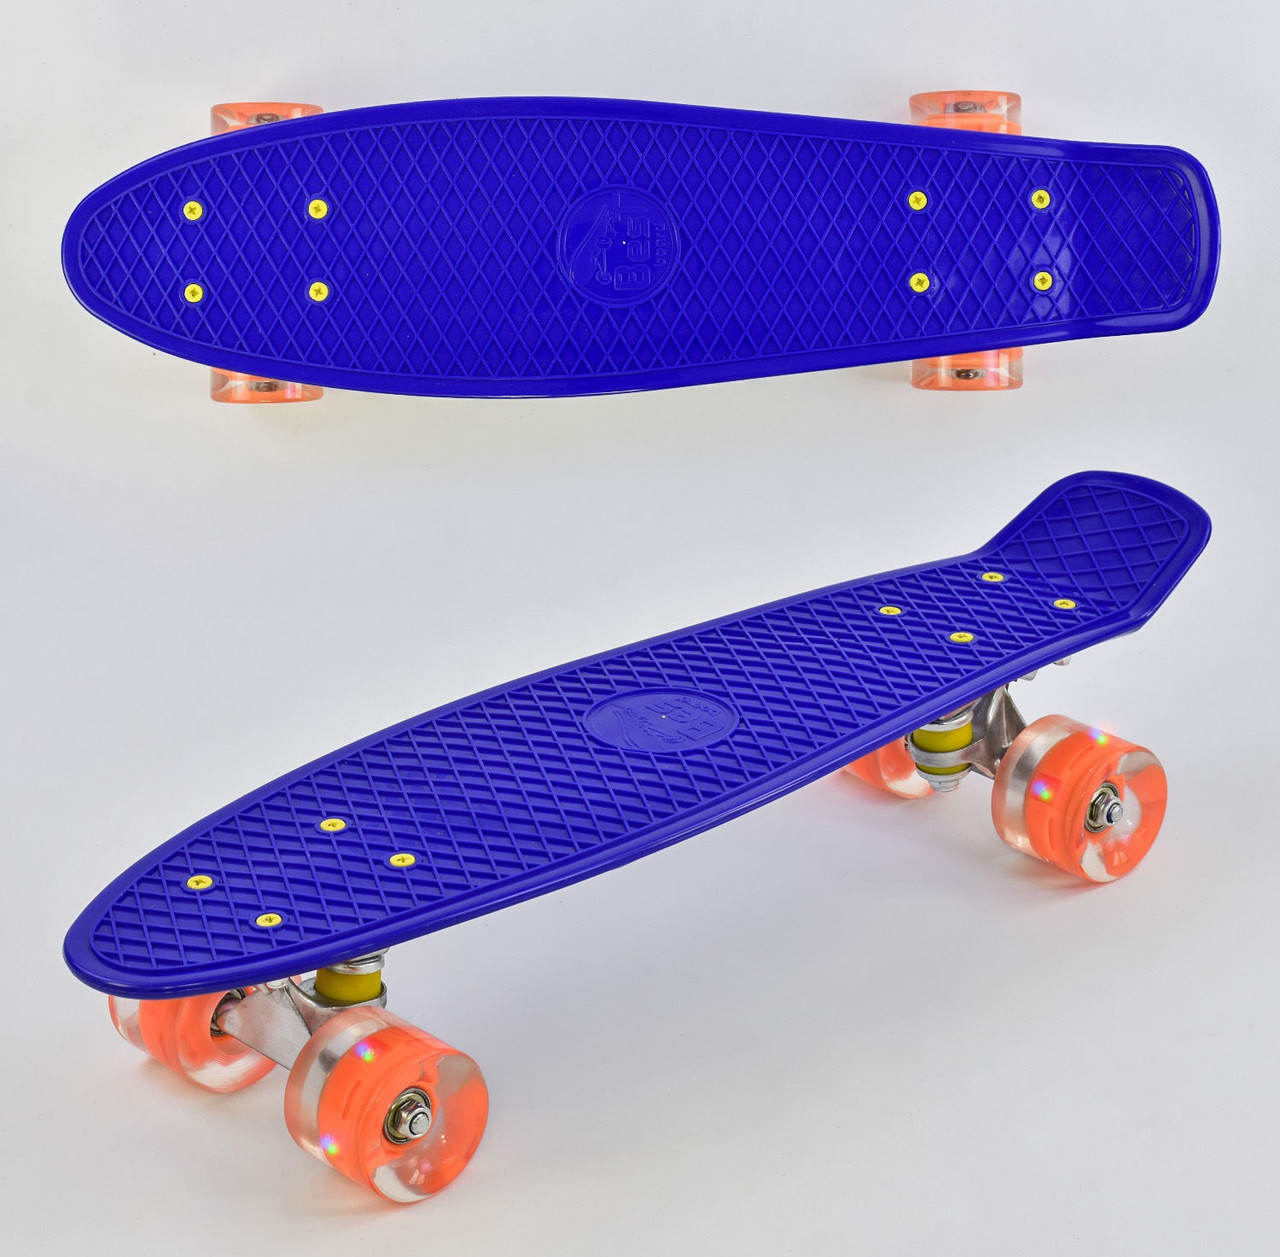 "Пенни борд скейт со светящимися колесами 22"" Best Board 7070 синий"